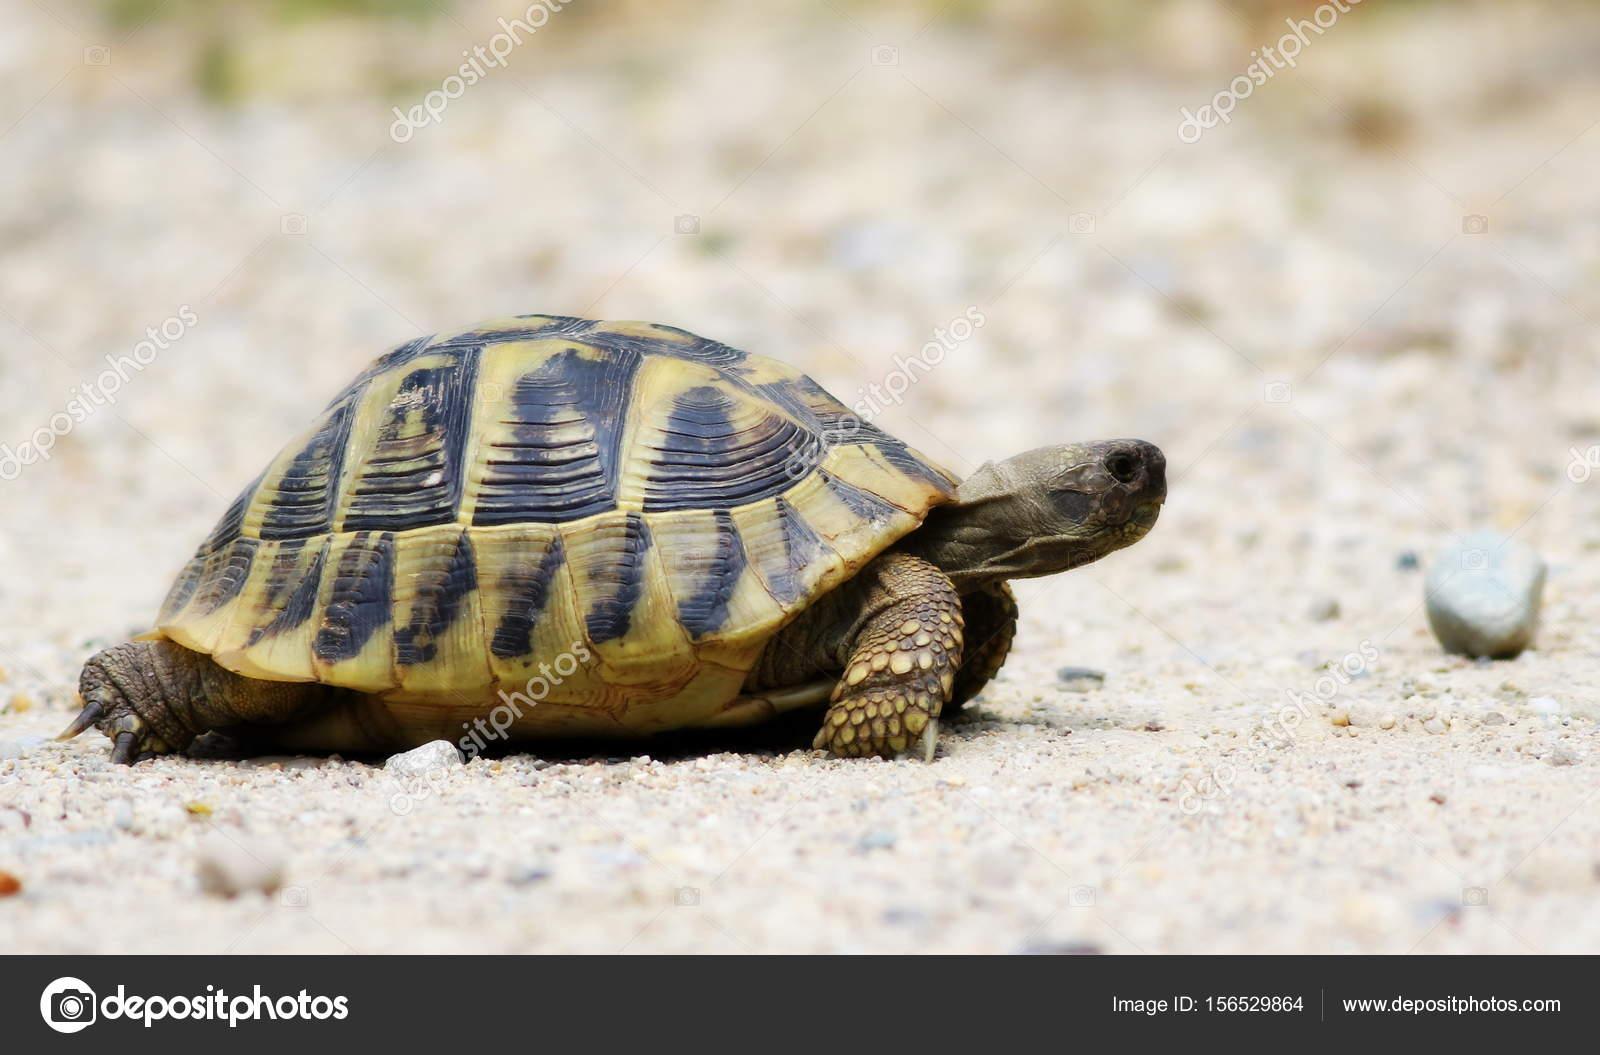 Testuggine di hermann tartaruga su sabbia testudo for Tartaruga prezzo